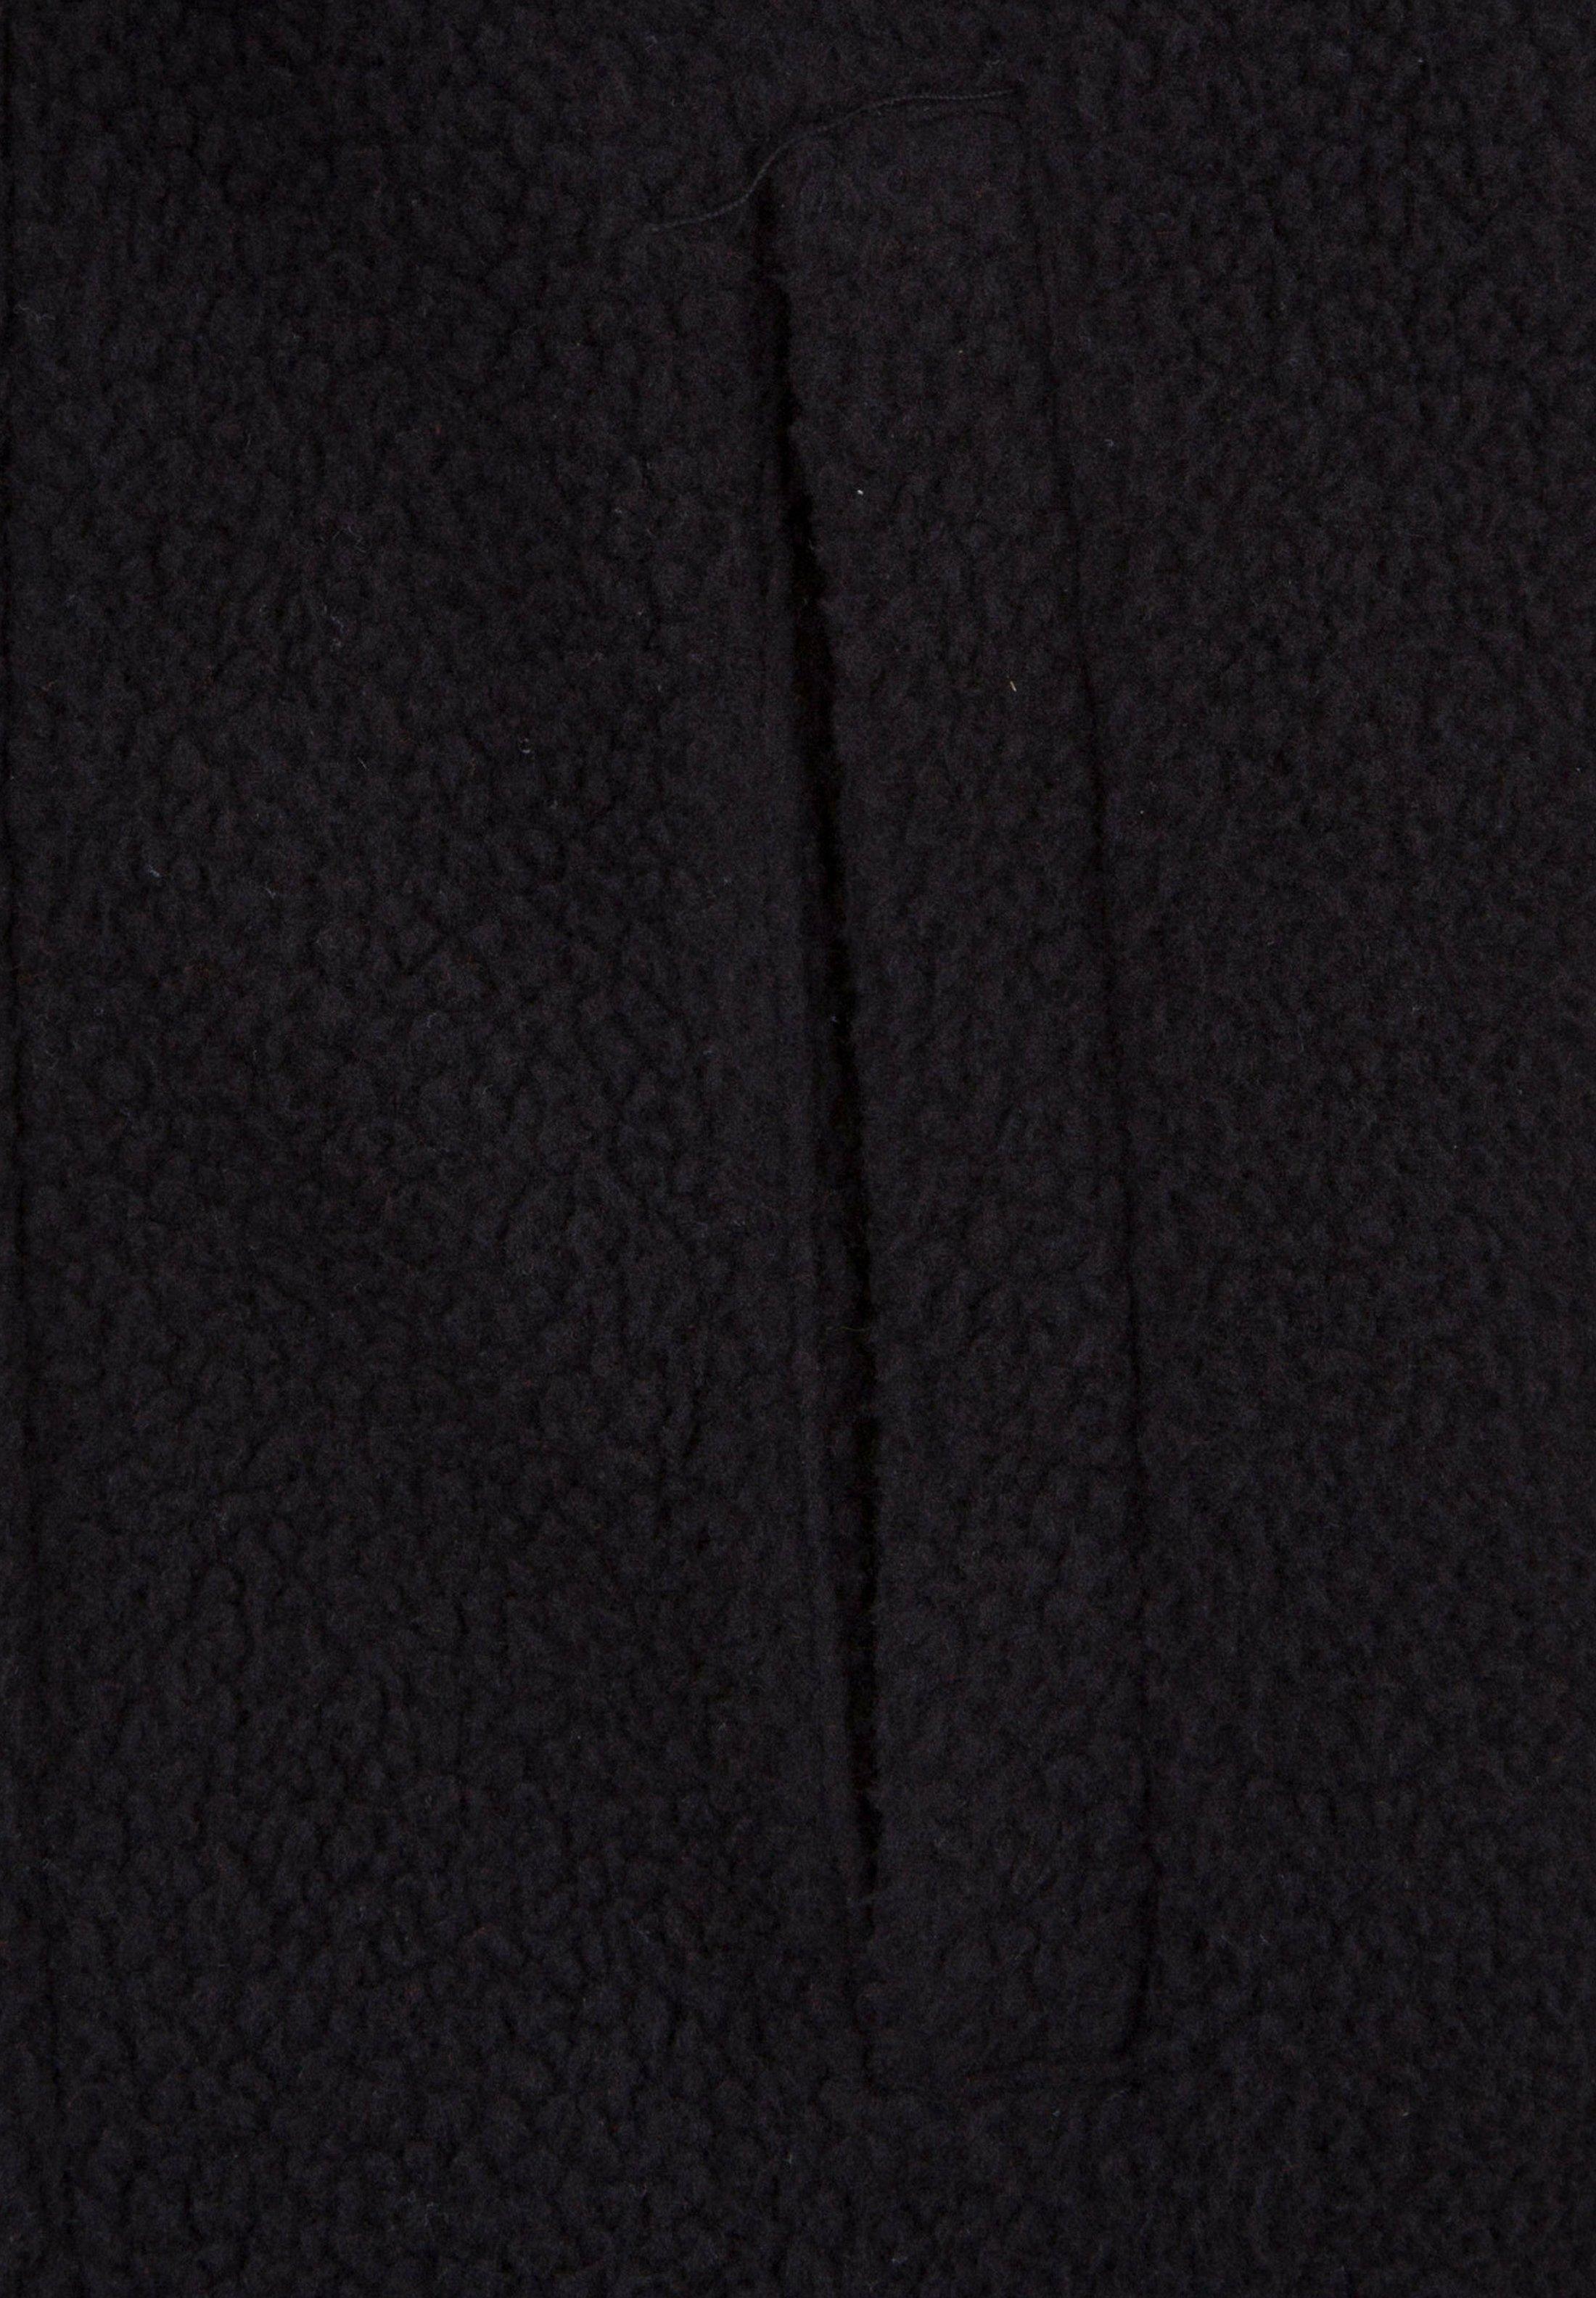 Umbro UMBRO RESORT ZIP POLAR FLEECE SWEATSHIRT HERREN - Bluza z polaru - stretch limo/bright white/poinsetta